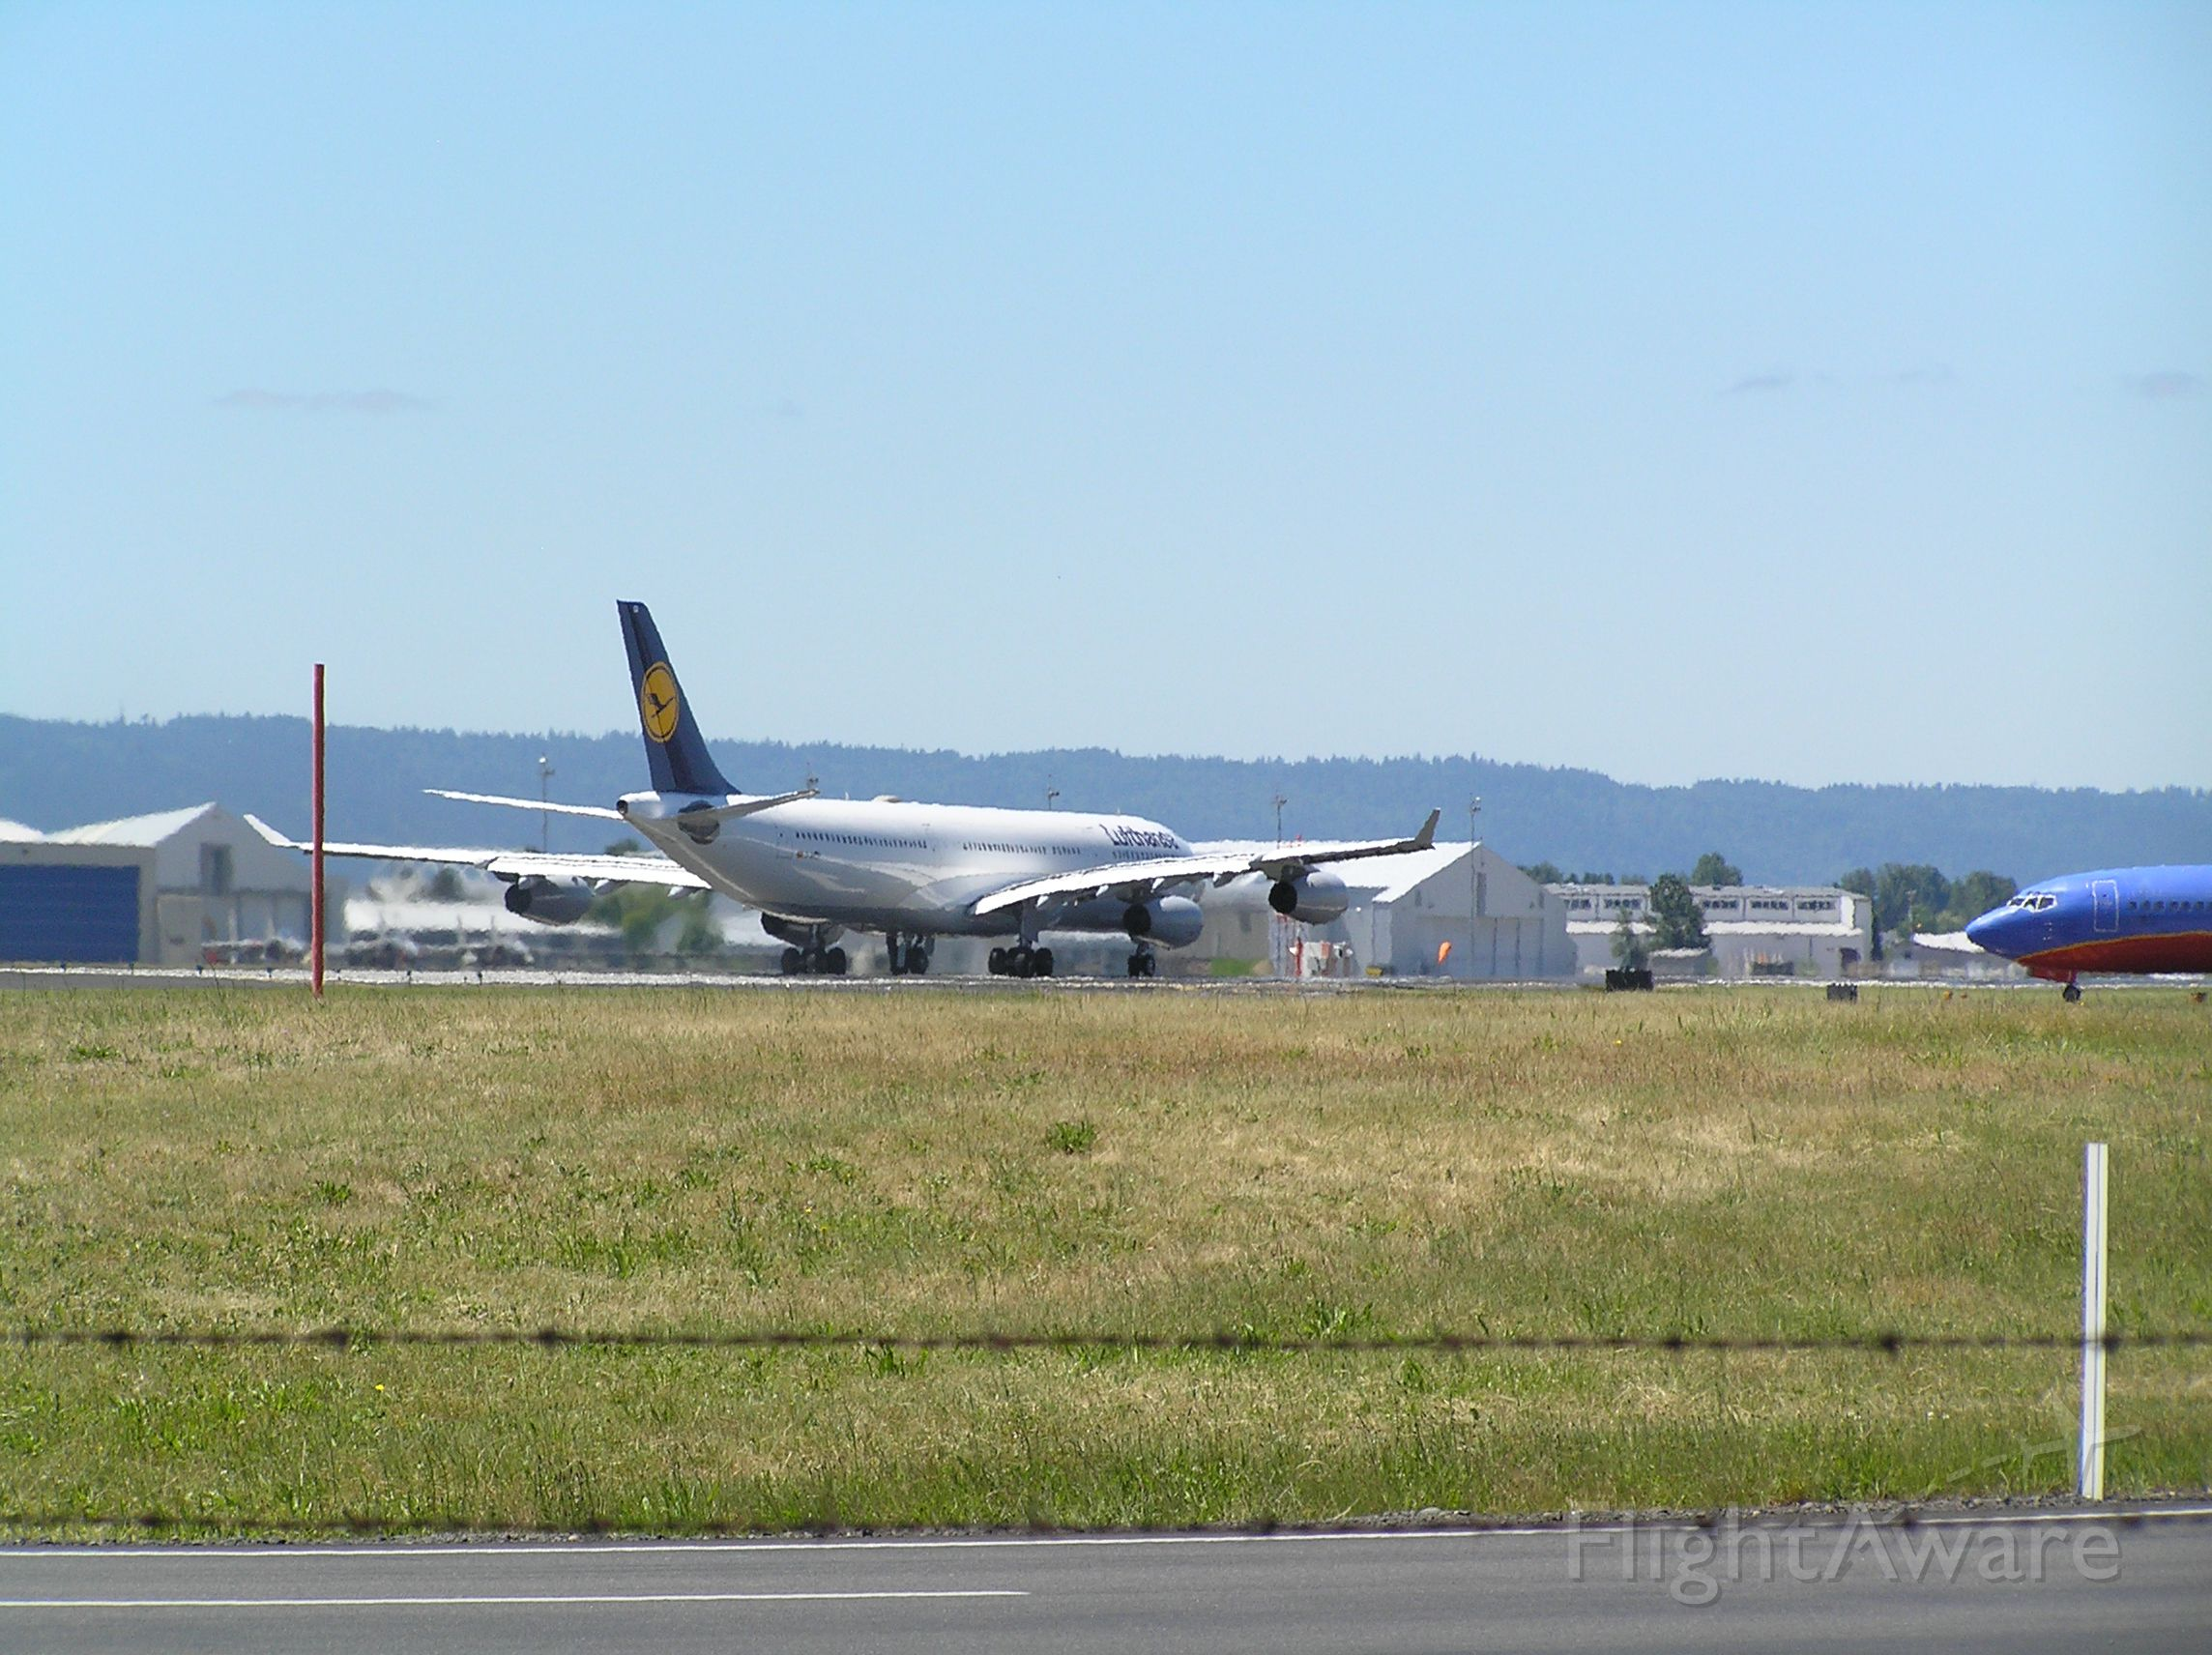 Airbus A340-300 (D-AJGJ) - rolling... enroute KPDX-EDDF, 2008-06-14; PDX revenue could not sustain this flight